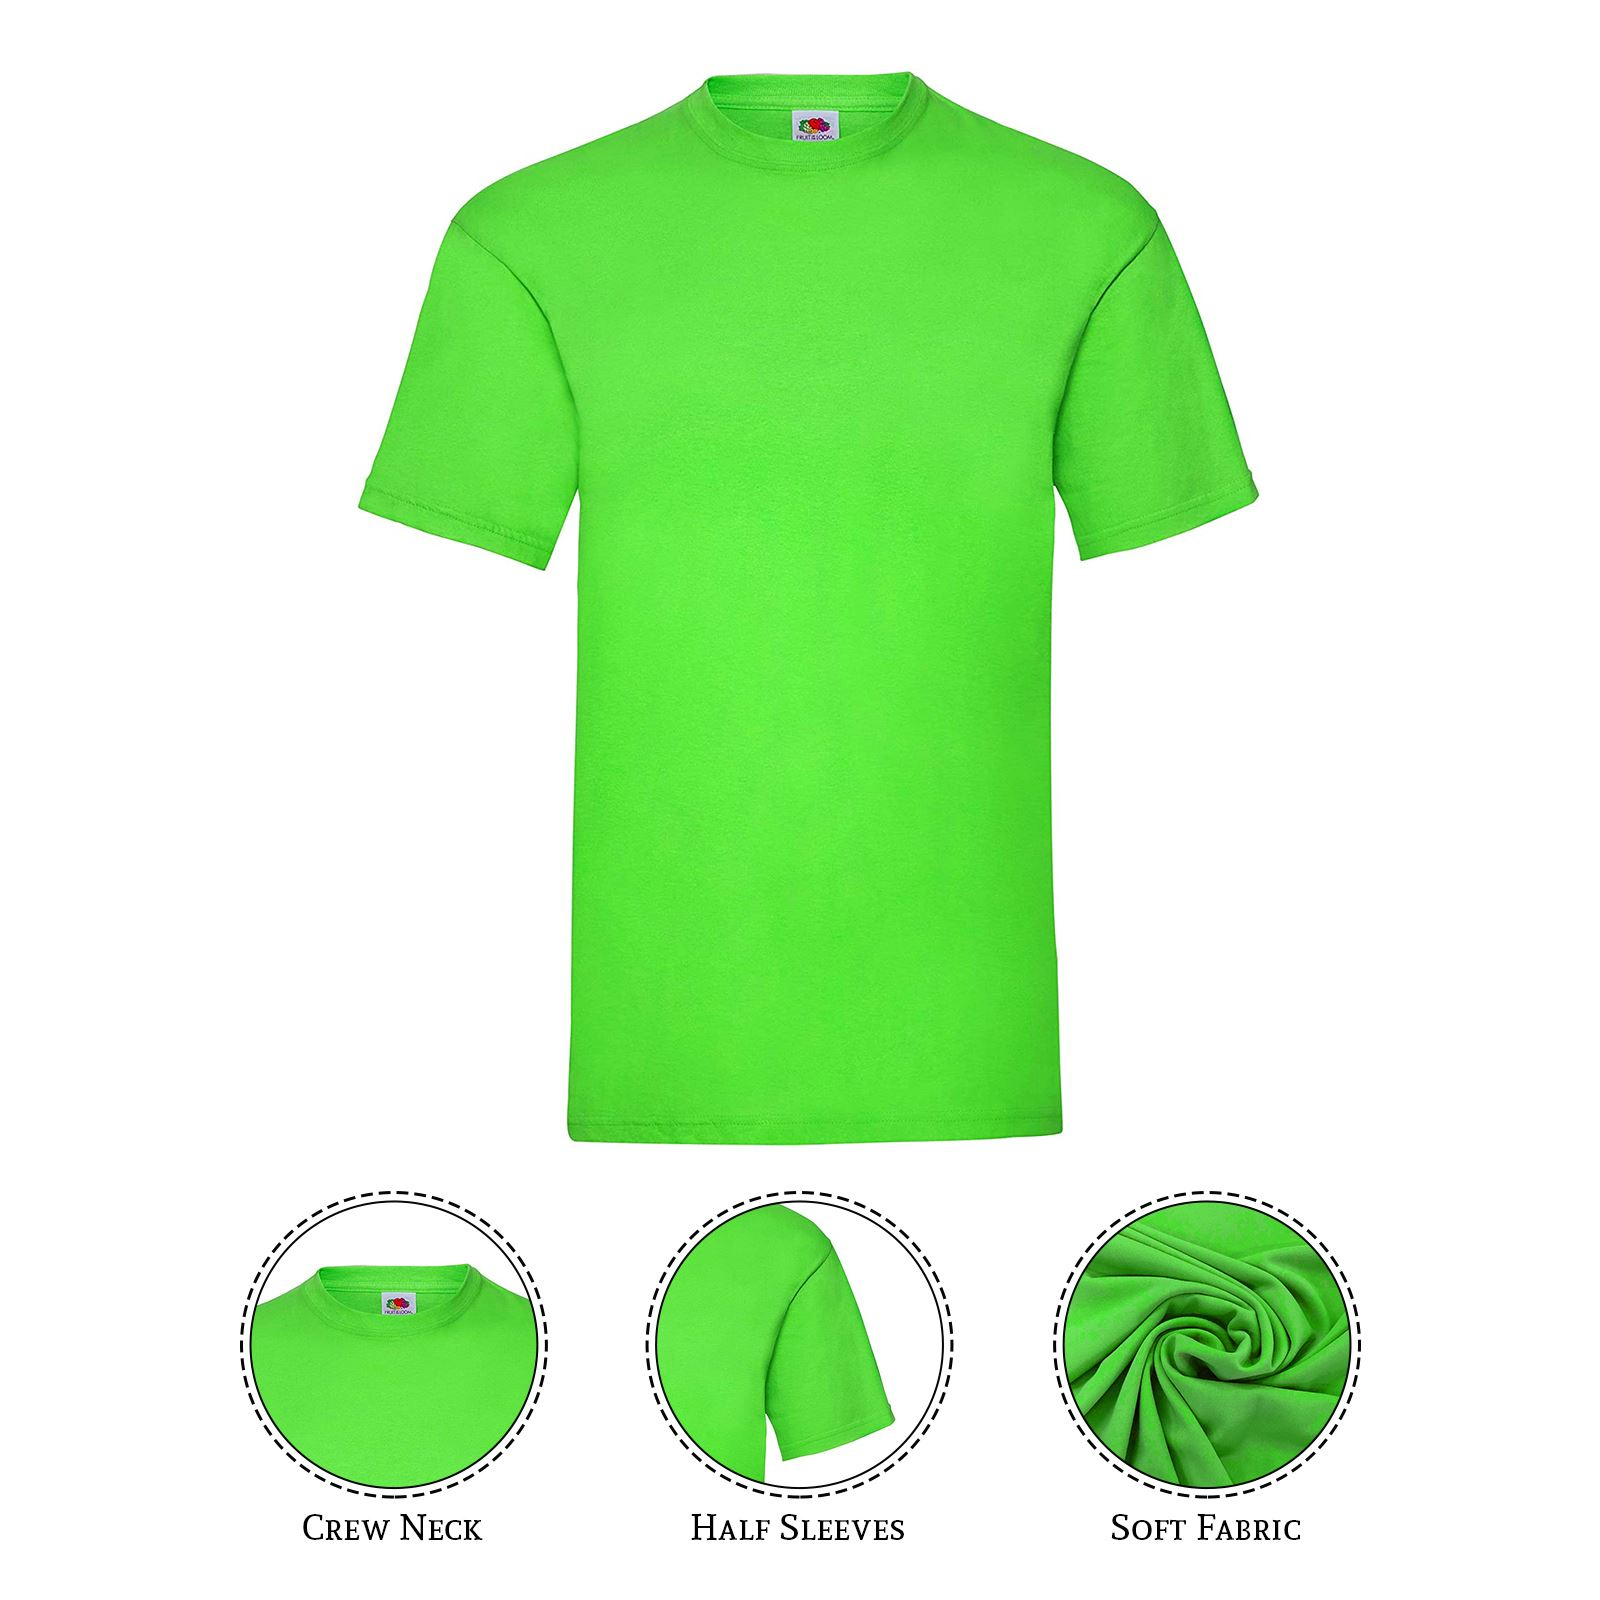 thumbnail 21 - Men-s-Fruit-Of-The-Loom-T-Shirt-Original-100-Cotton-Casual-Plain-Top-Tee